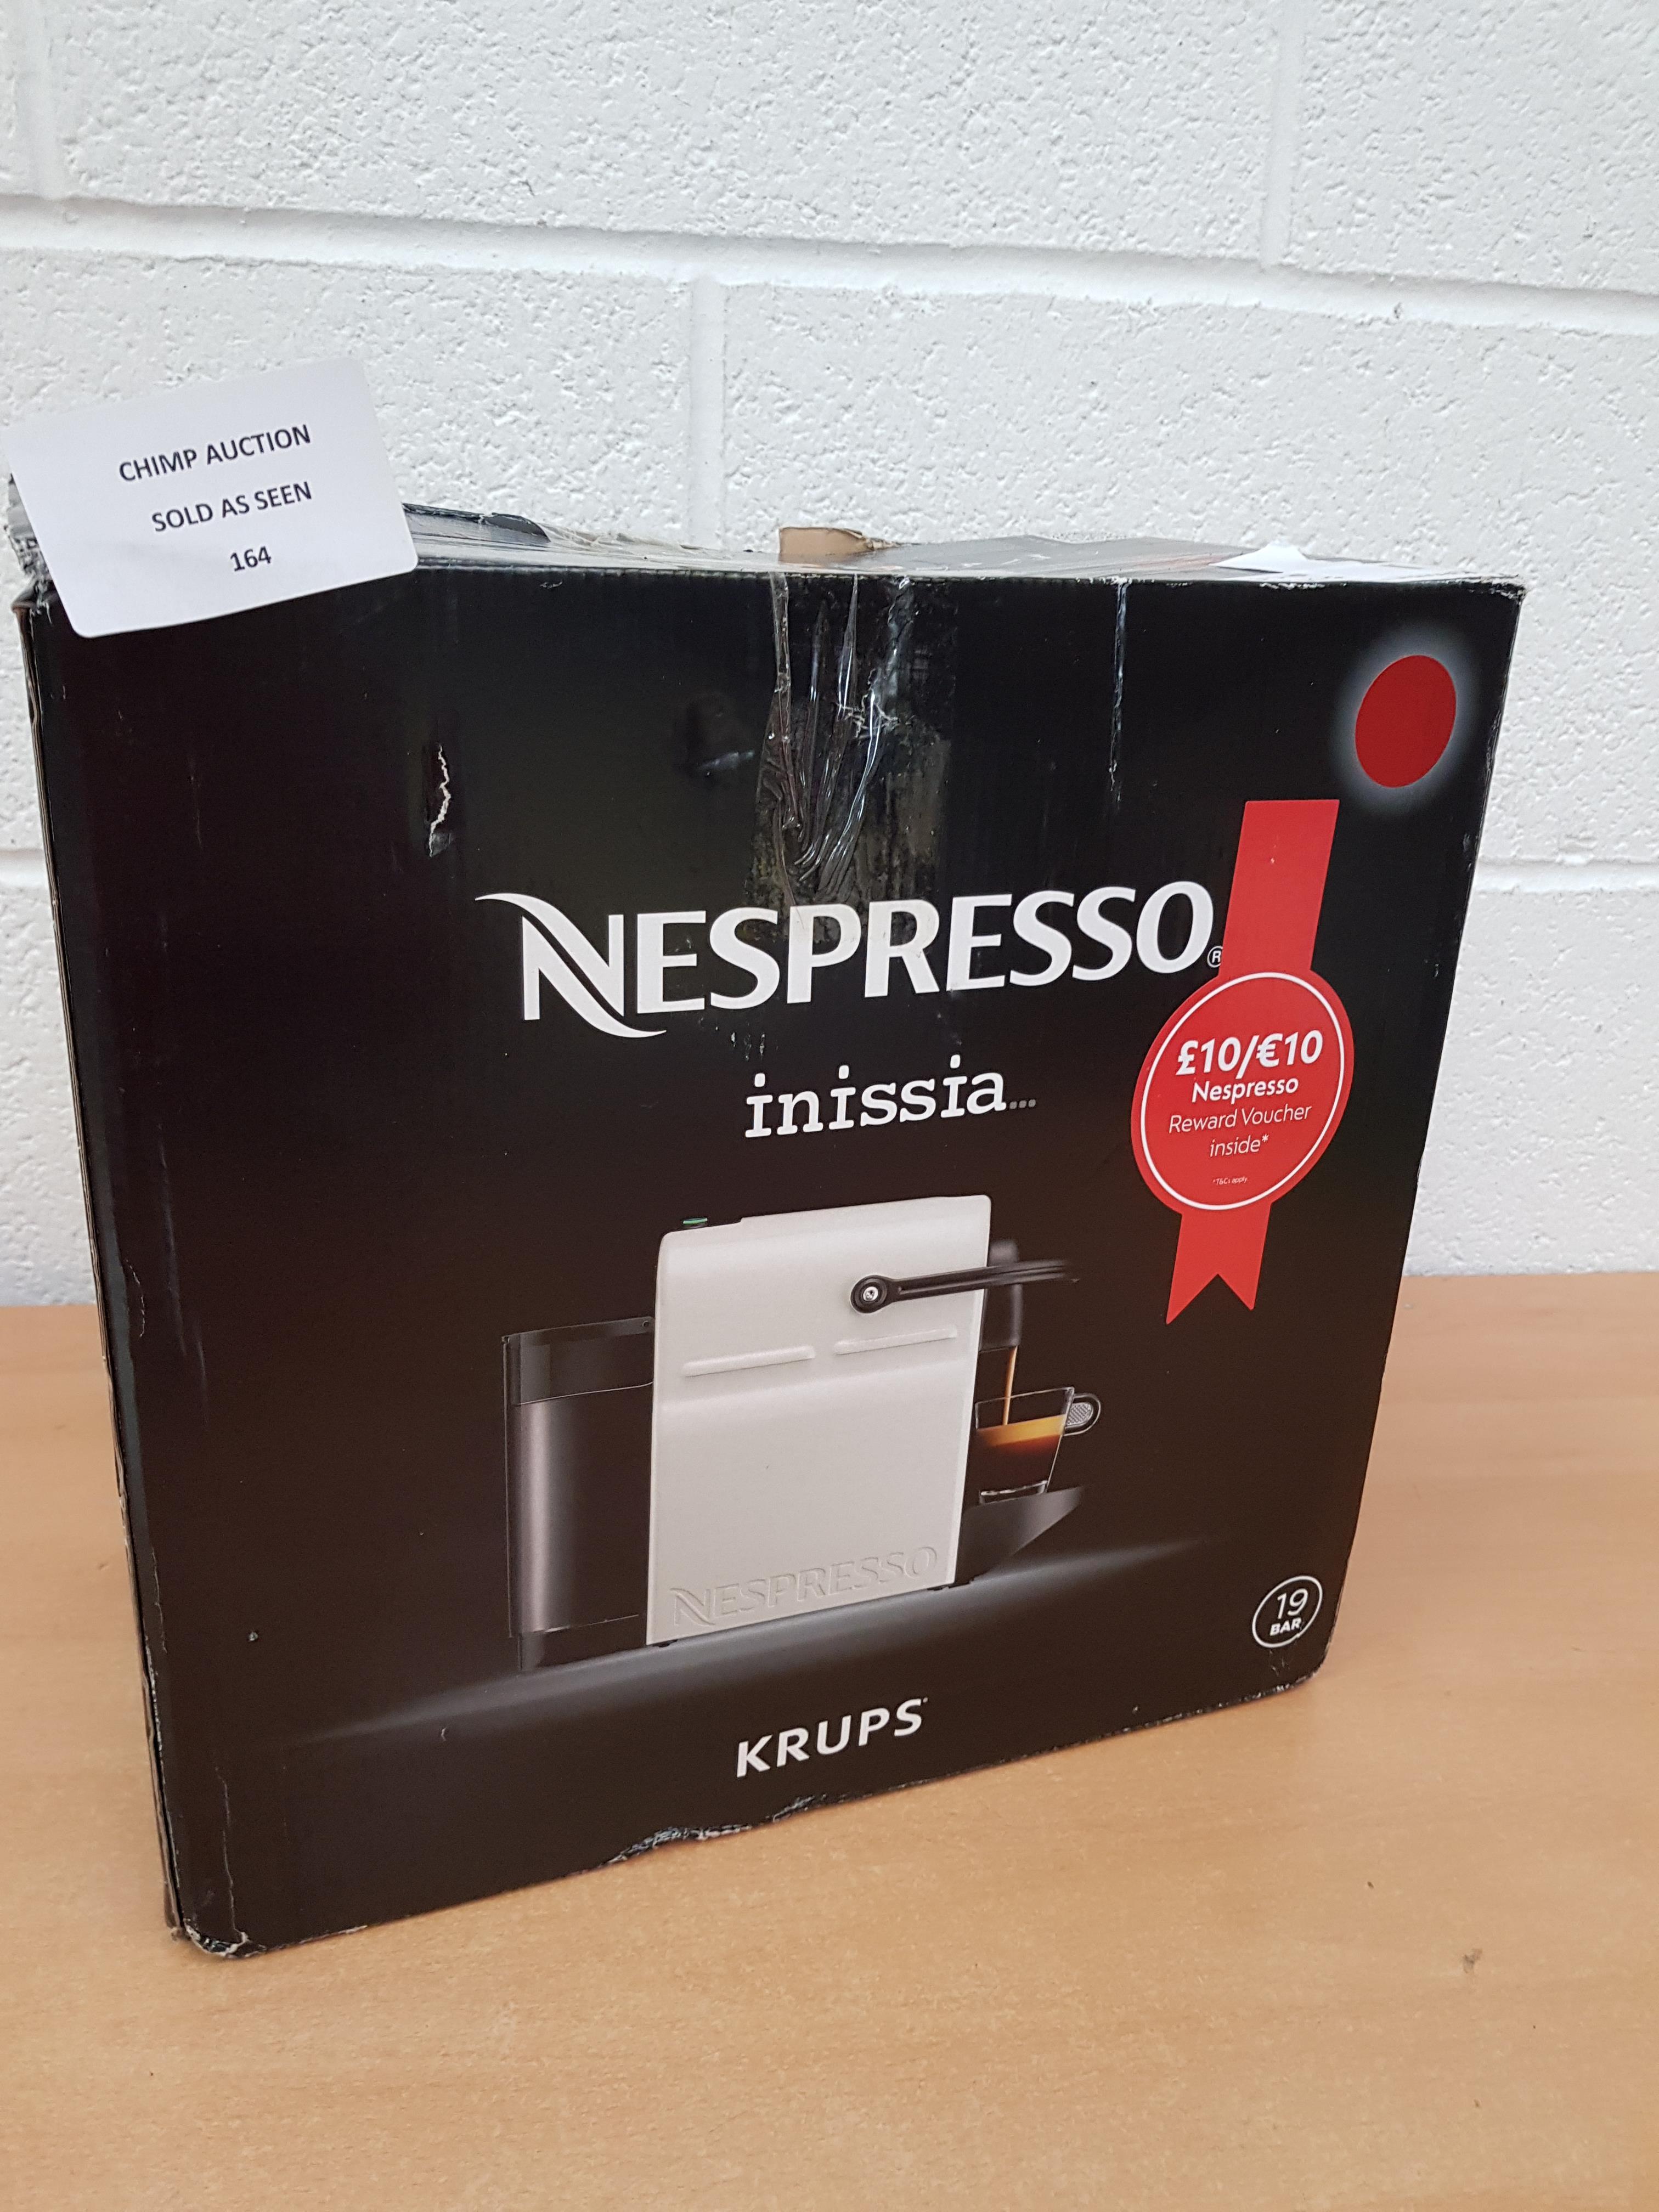 Lot 164 - Krups Nespresso Inissia Coffee Capsule Machine RRP £179.99